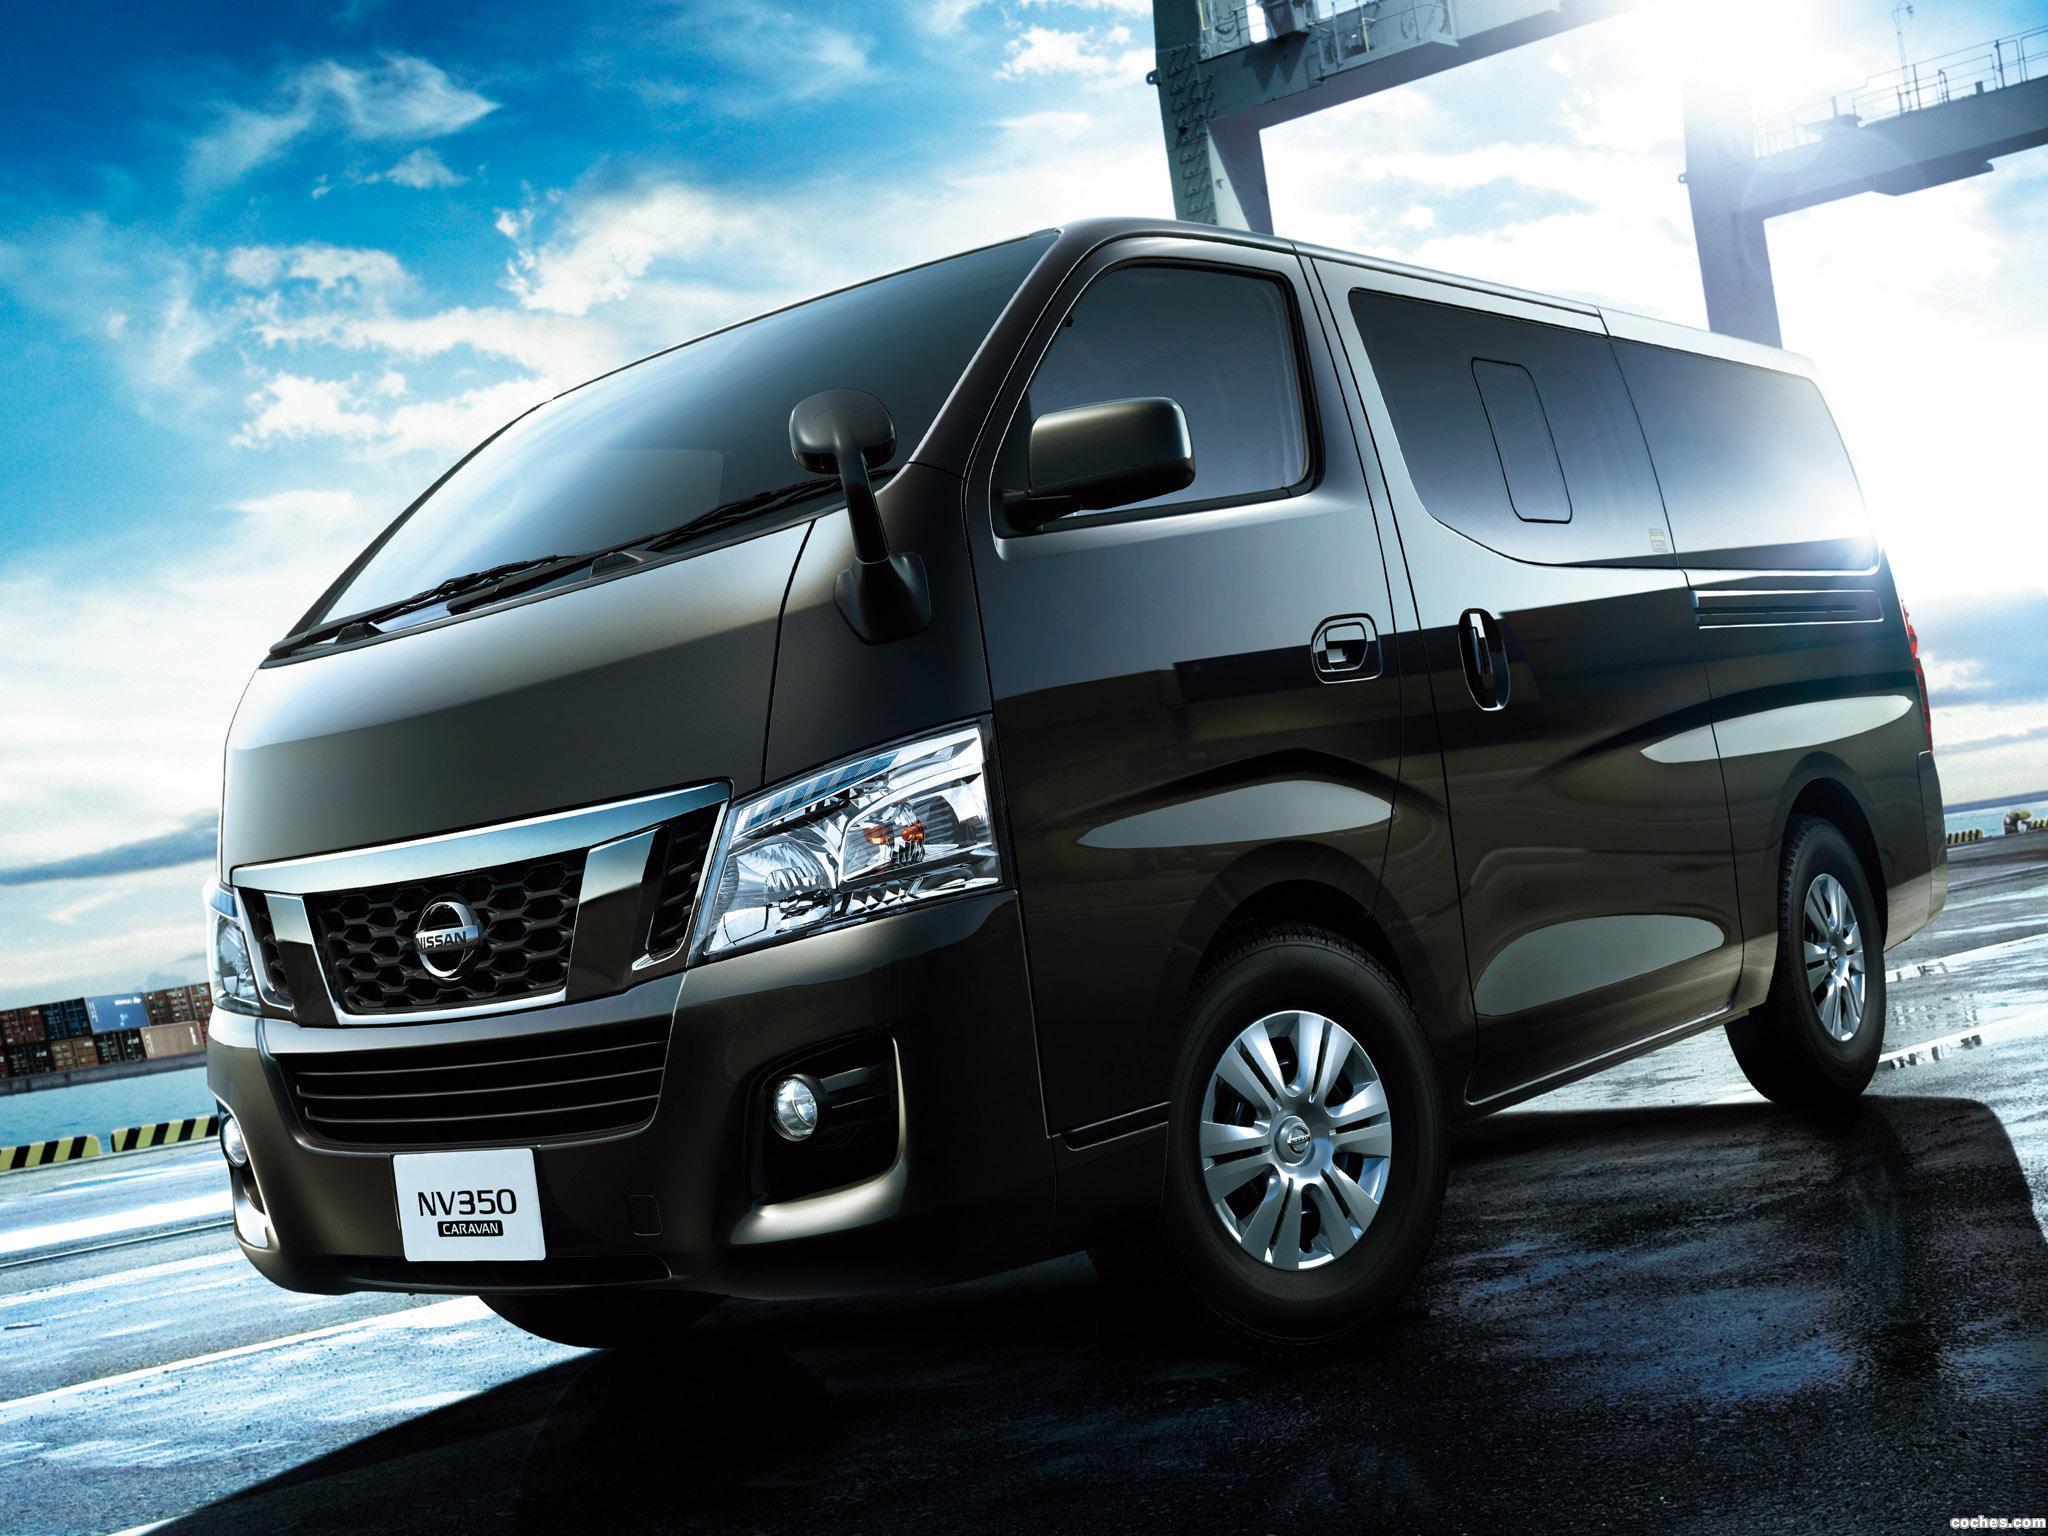 Foto 0 de Nissan NV350 Caravan Premium GX E26 2012